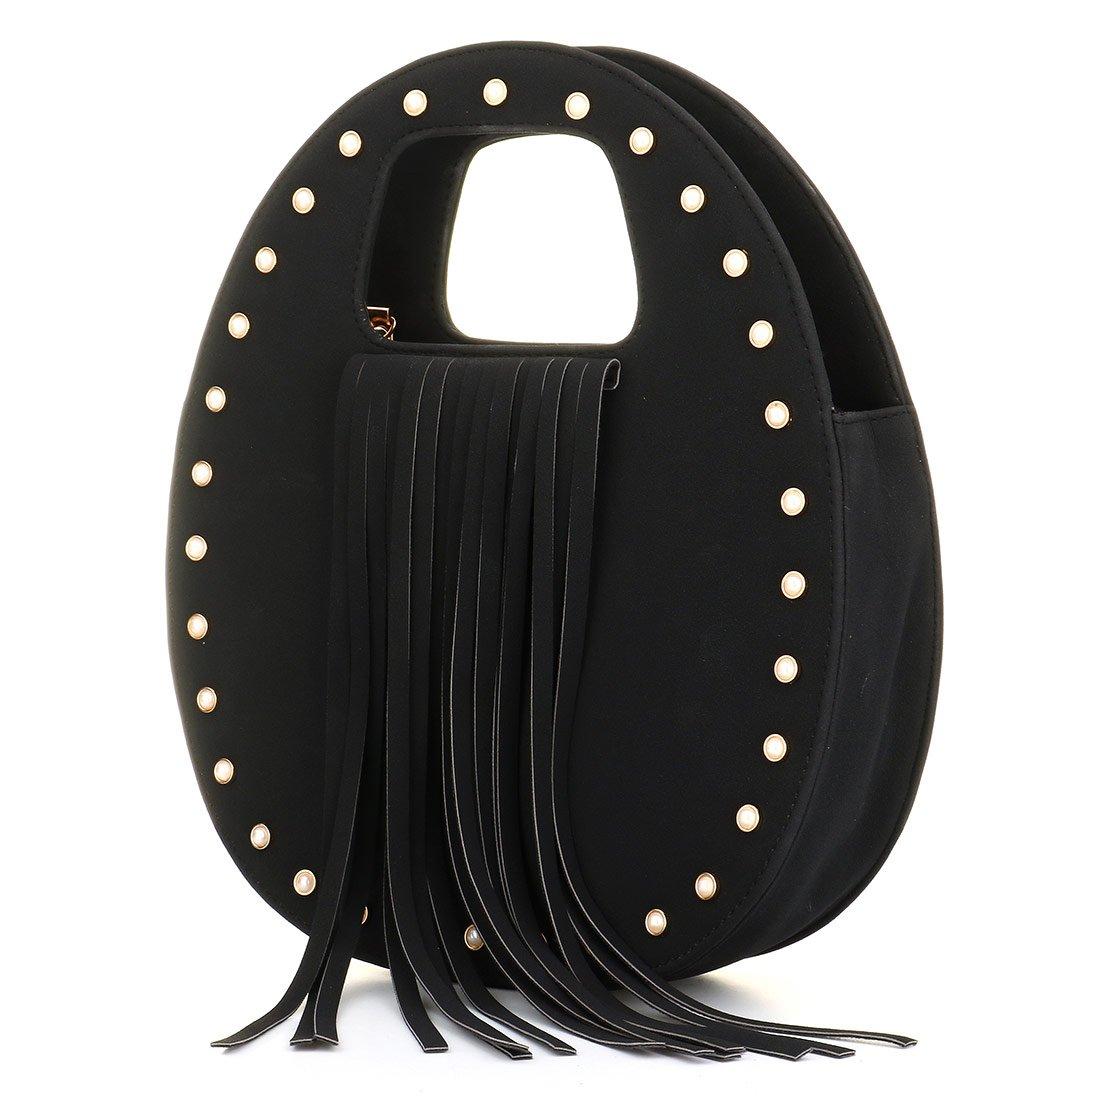 Women Handbag PU Leather Italy Fashion Top Handle Specialty Unique Bag Fringe Design Black